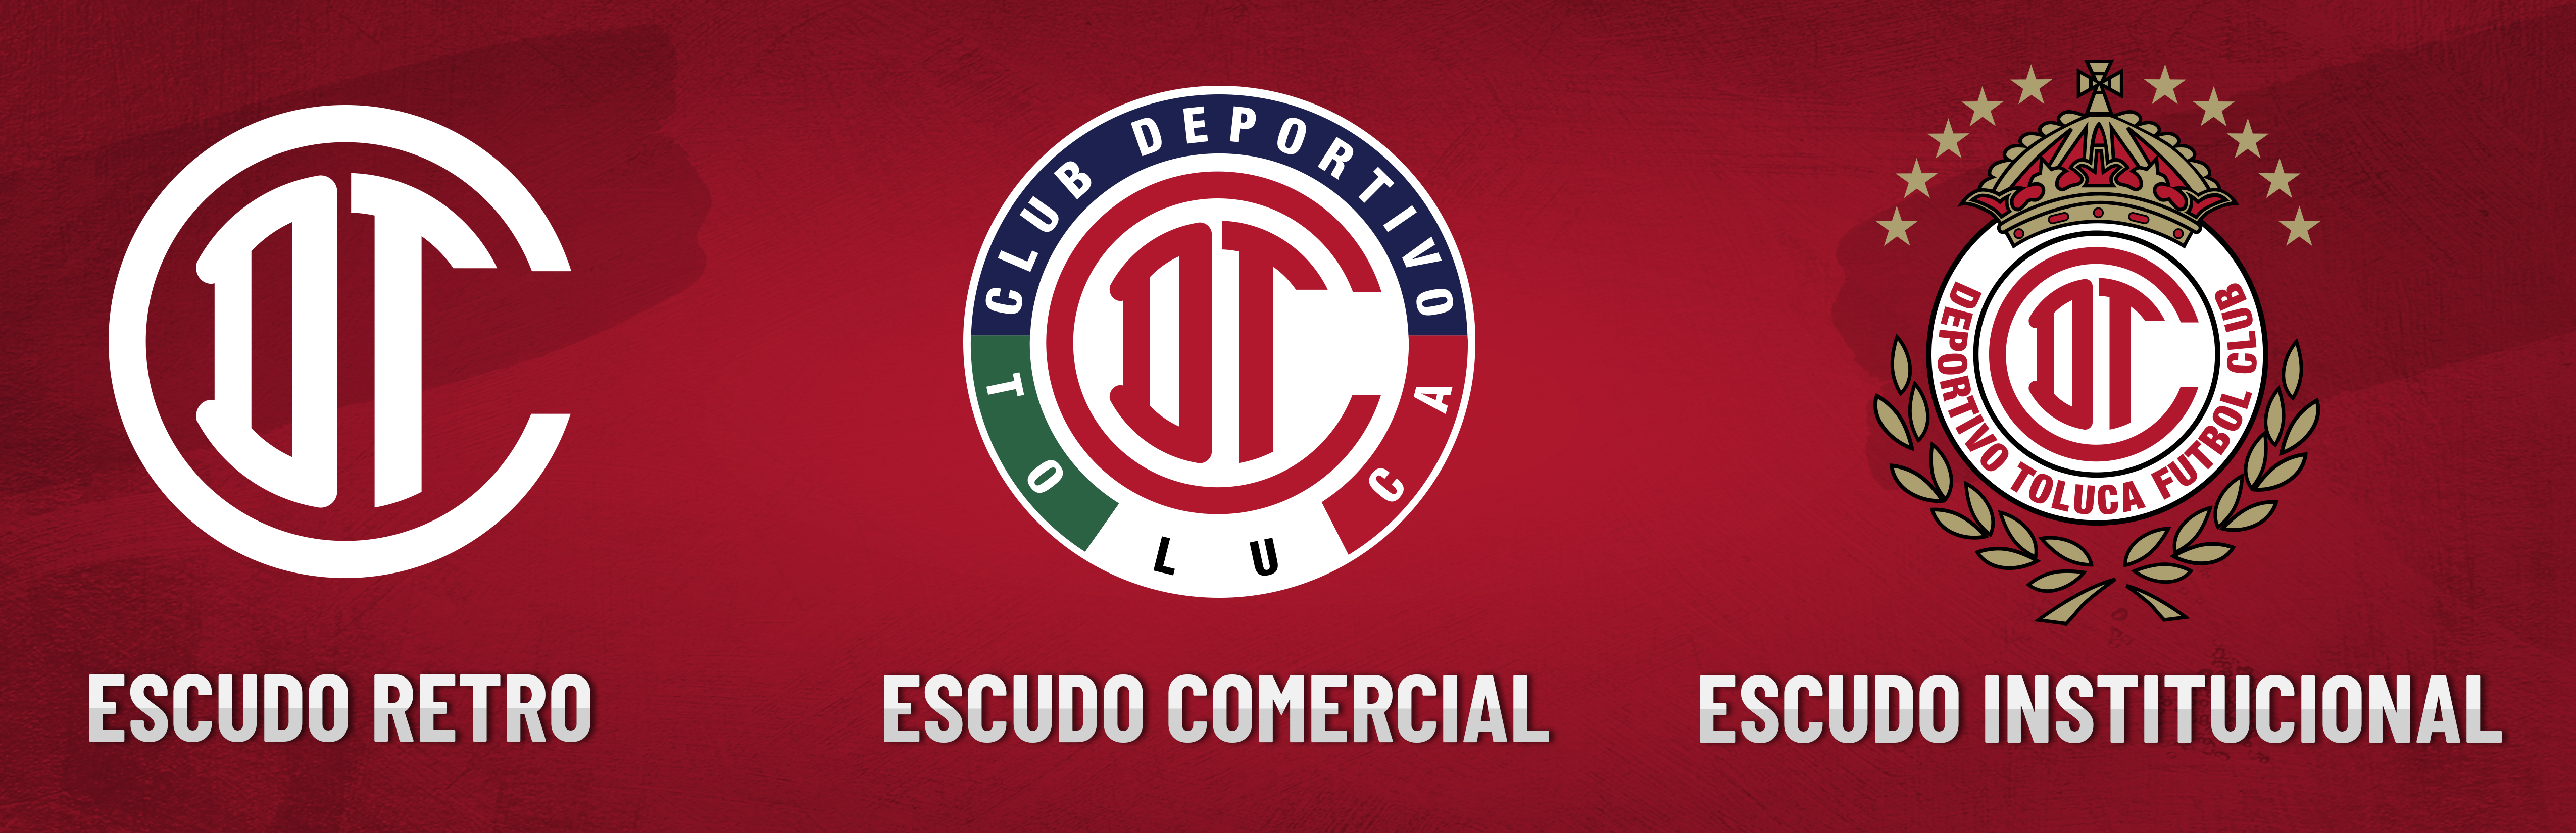 Escudo Toluca FC